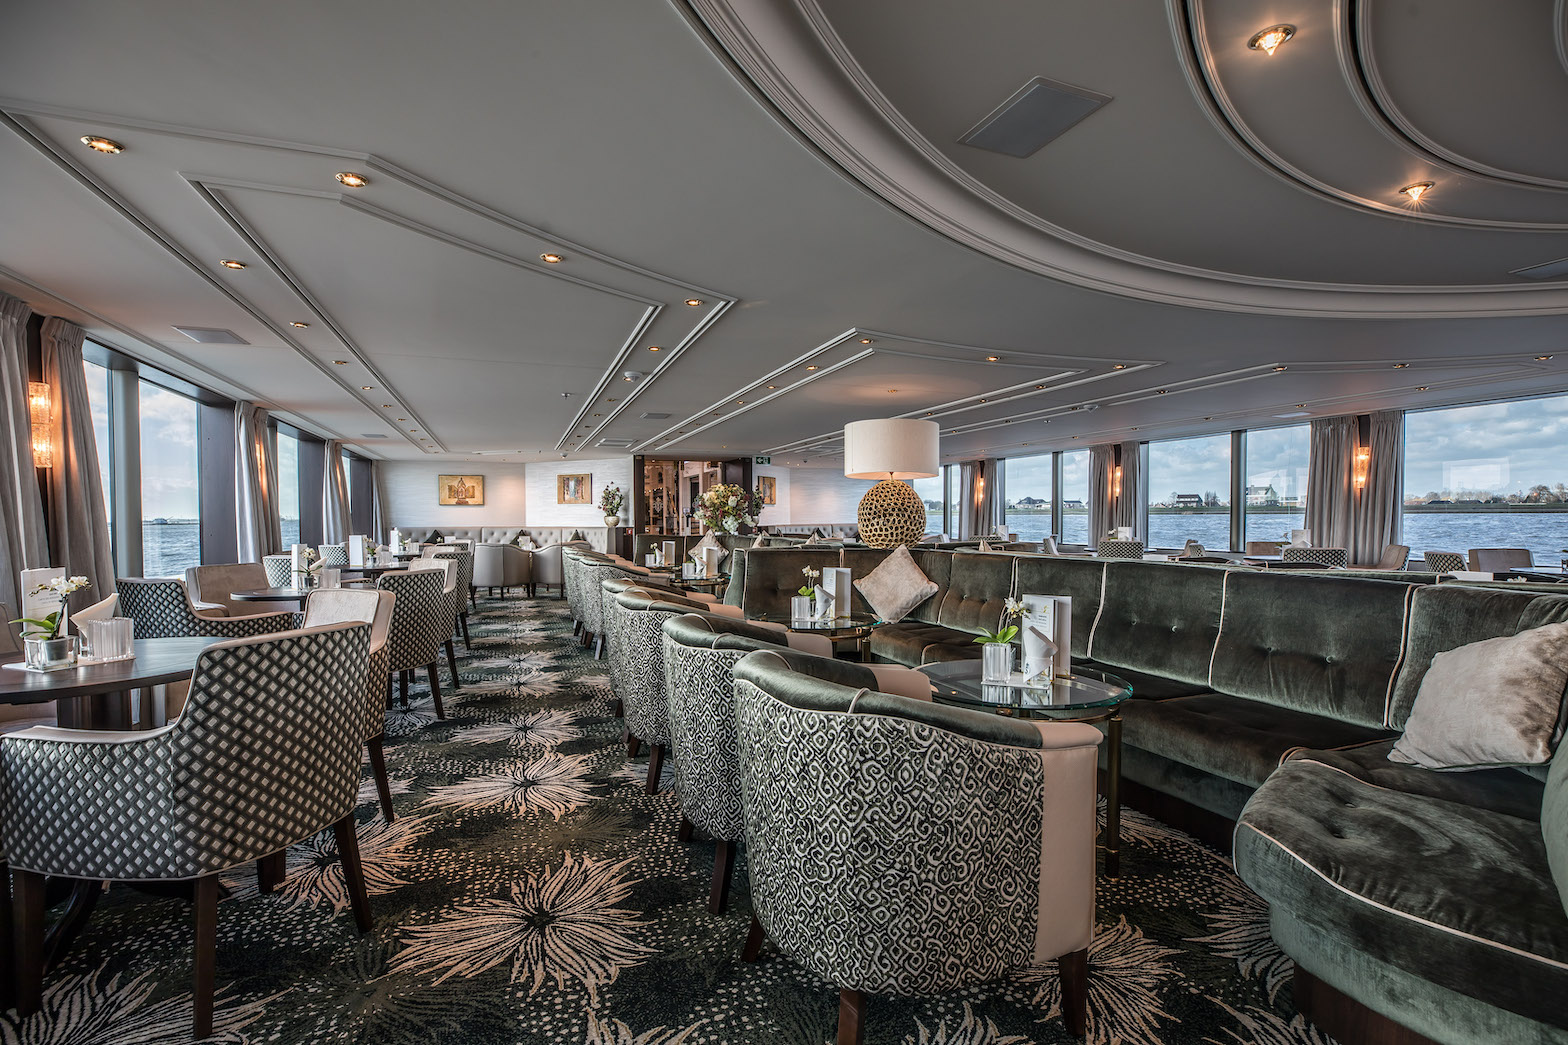 MS Geoffrey Chaucer Panorama Lounge mit Bar